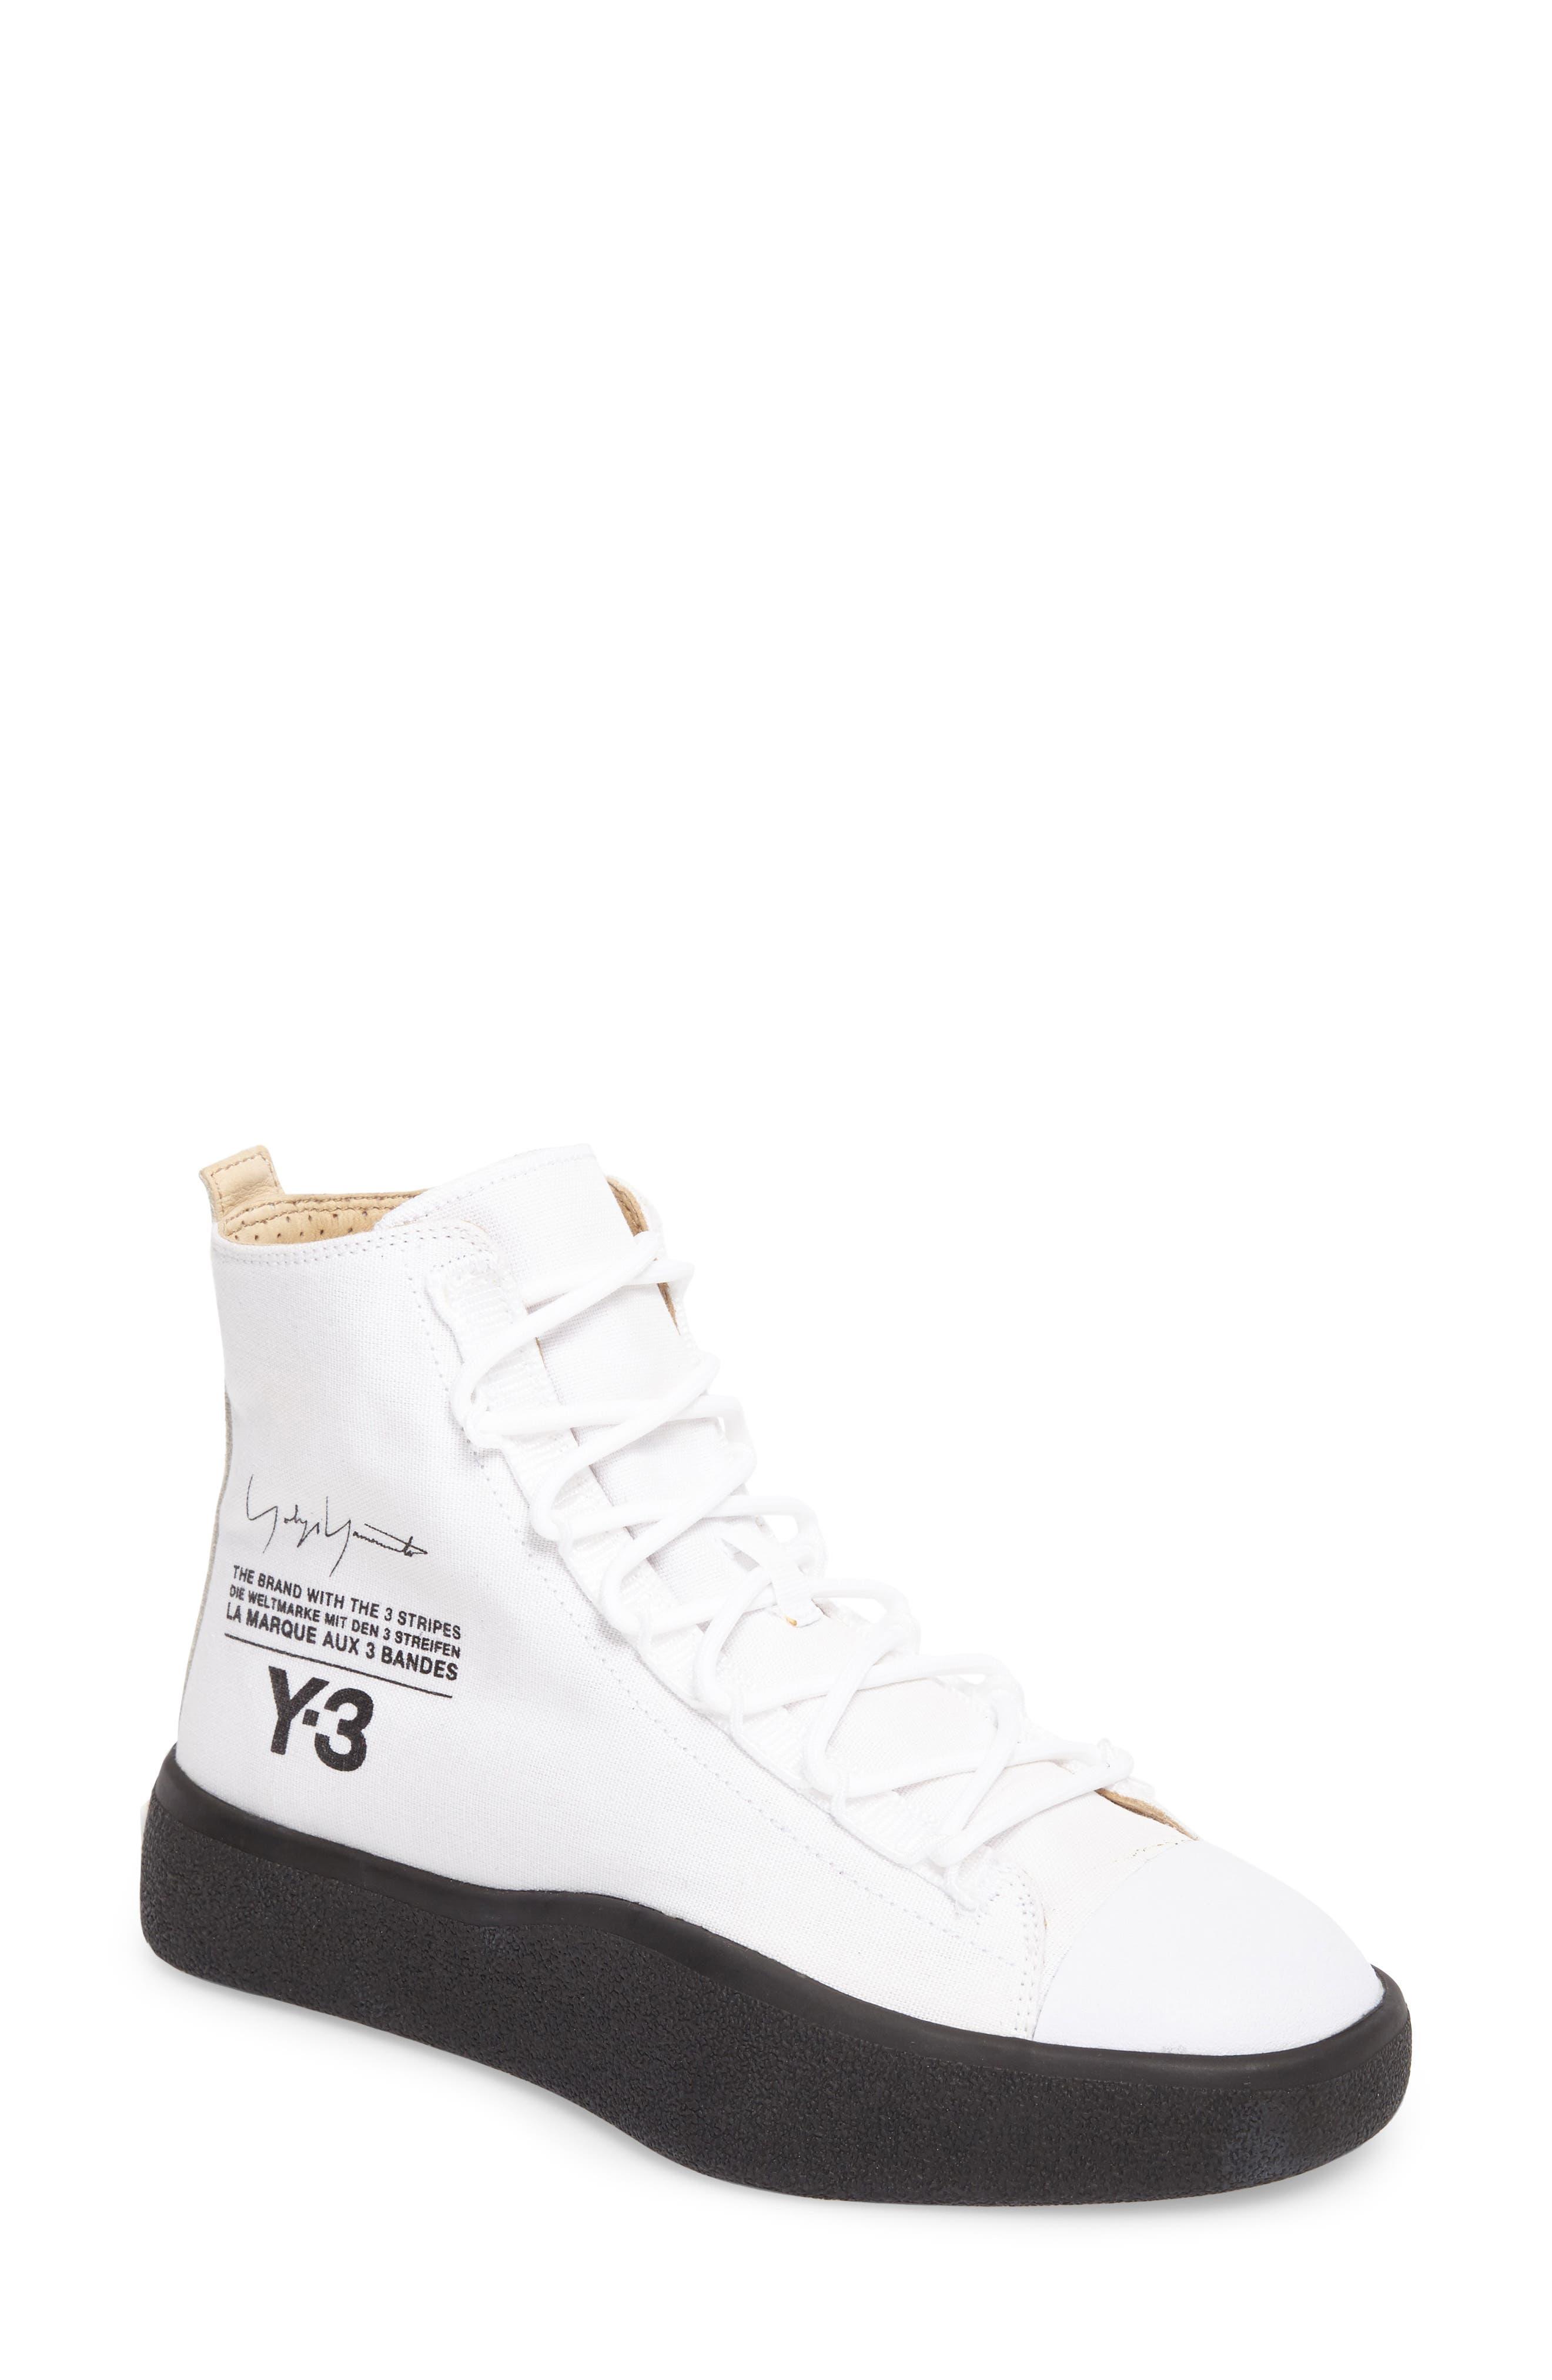 Bashyo High Top Sneaker,                             Main thumbnail 1, color,                             100